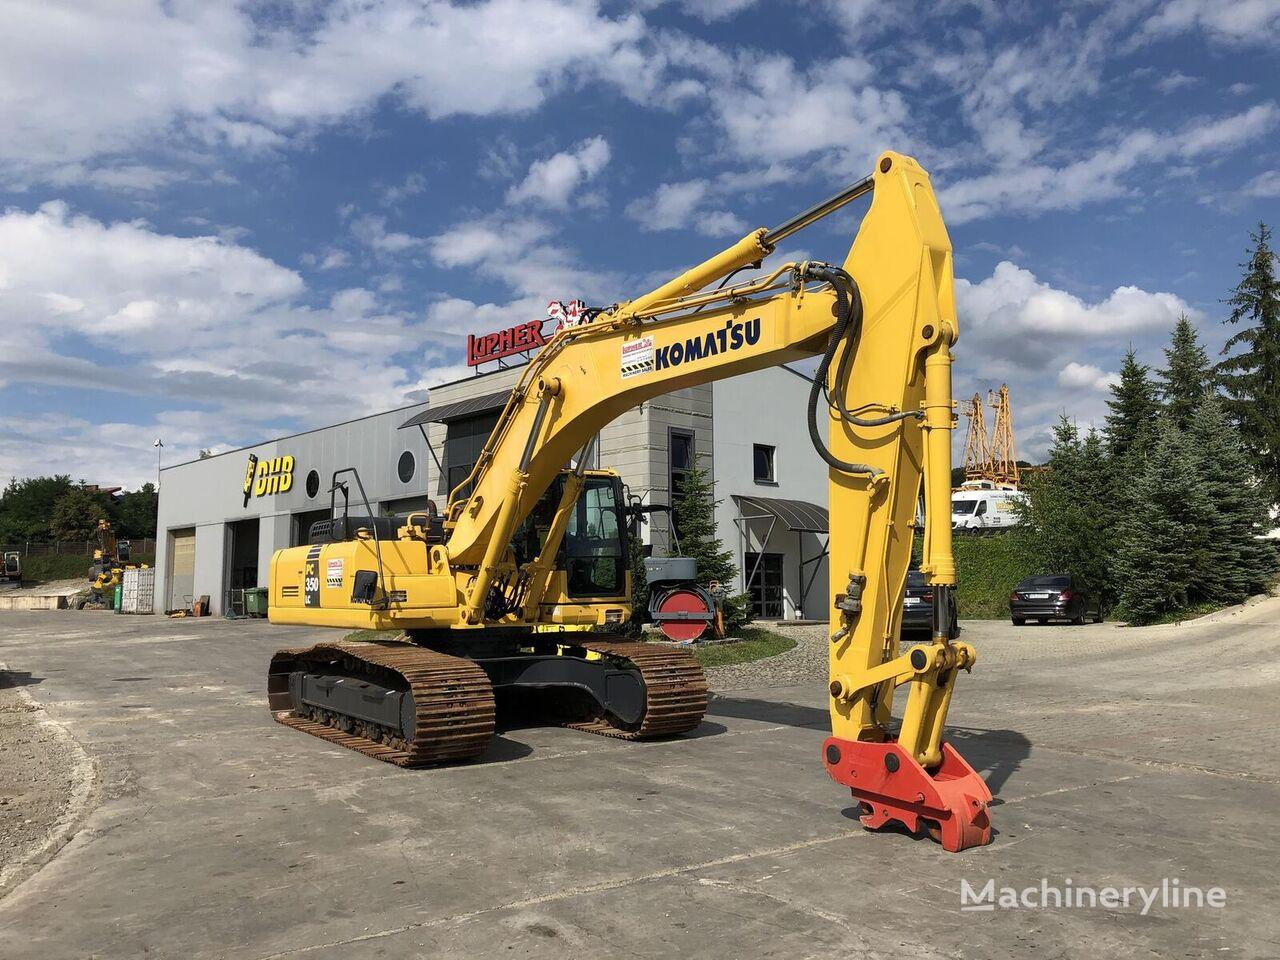 KOMATSU Pc350Lc-8 tracked excavator